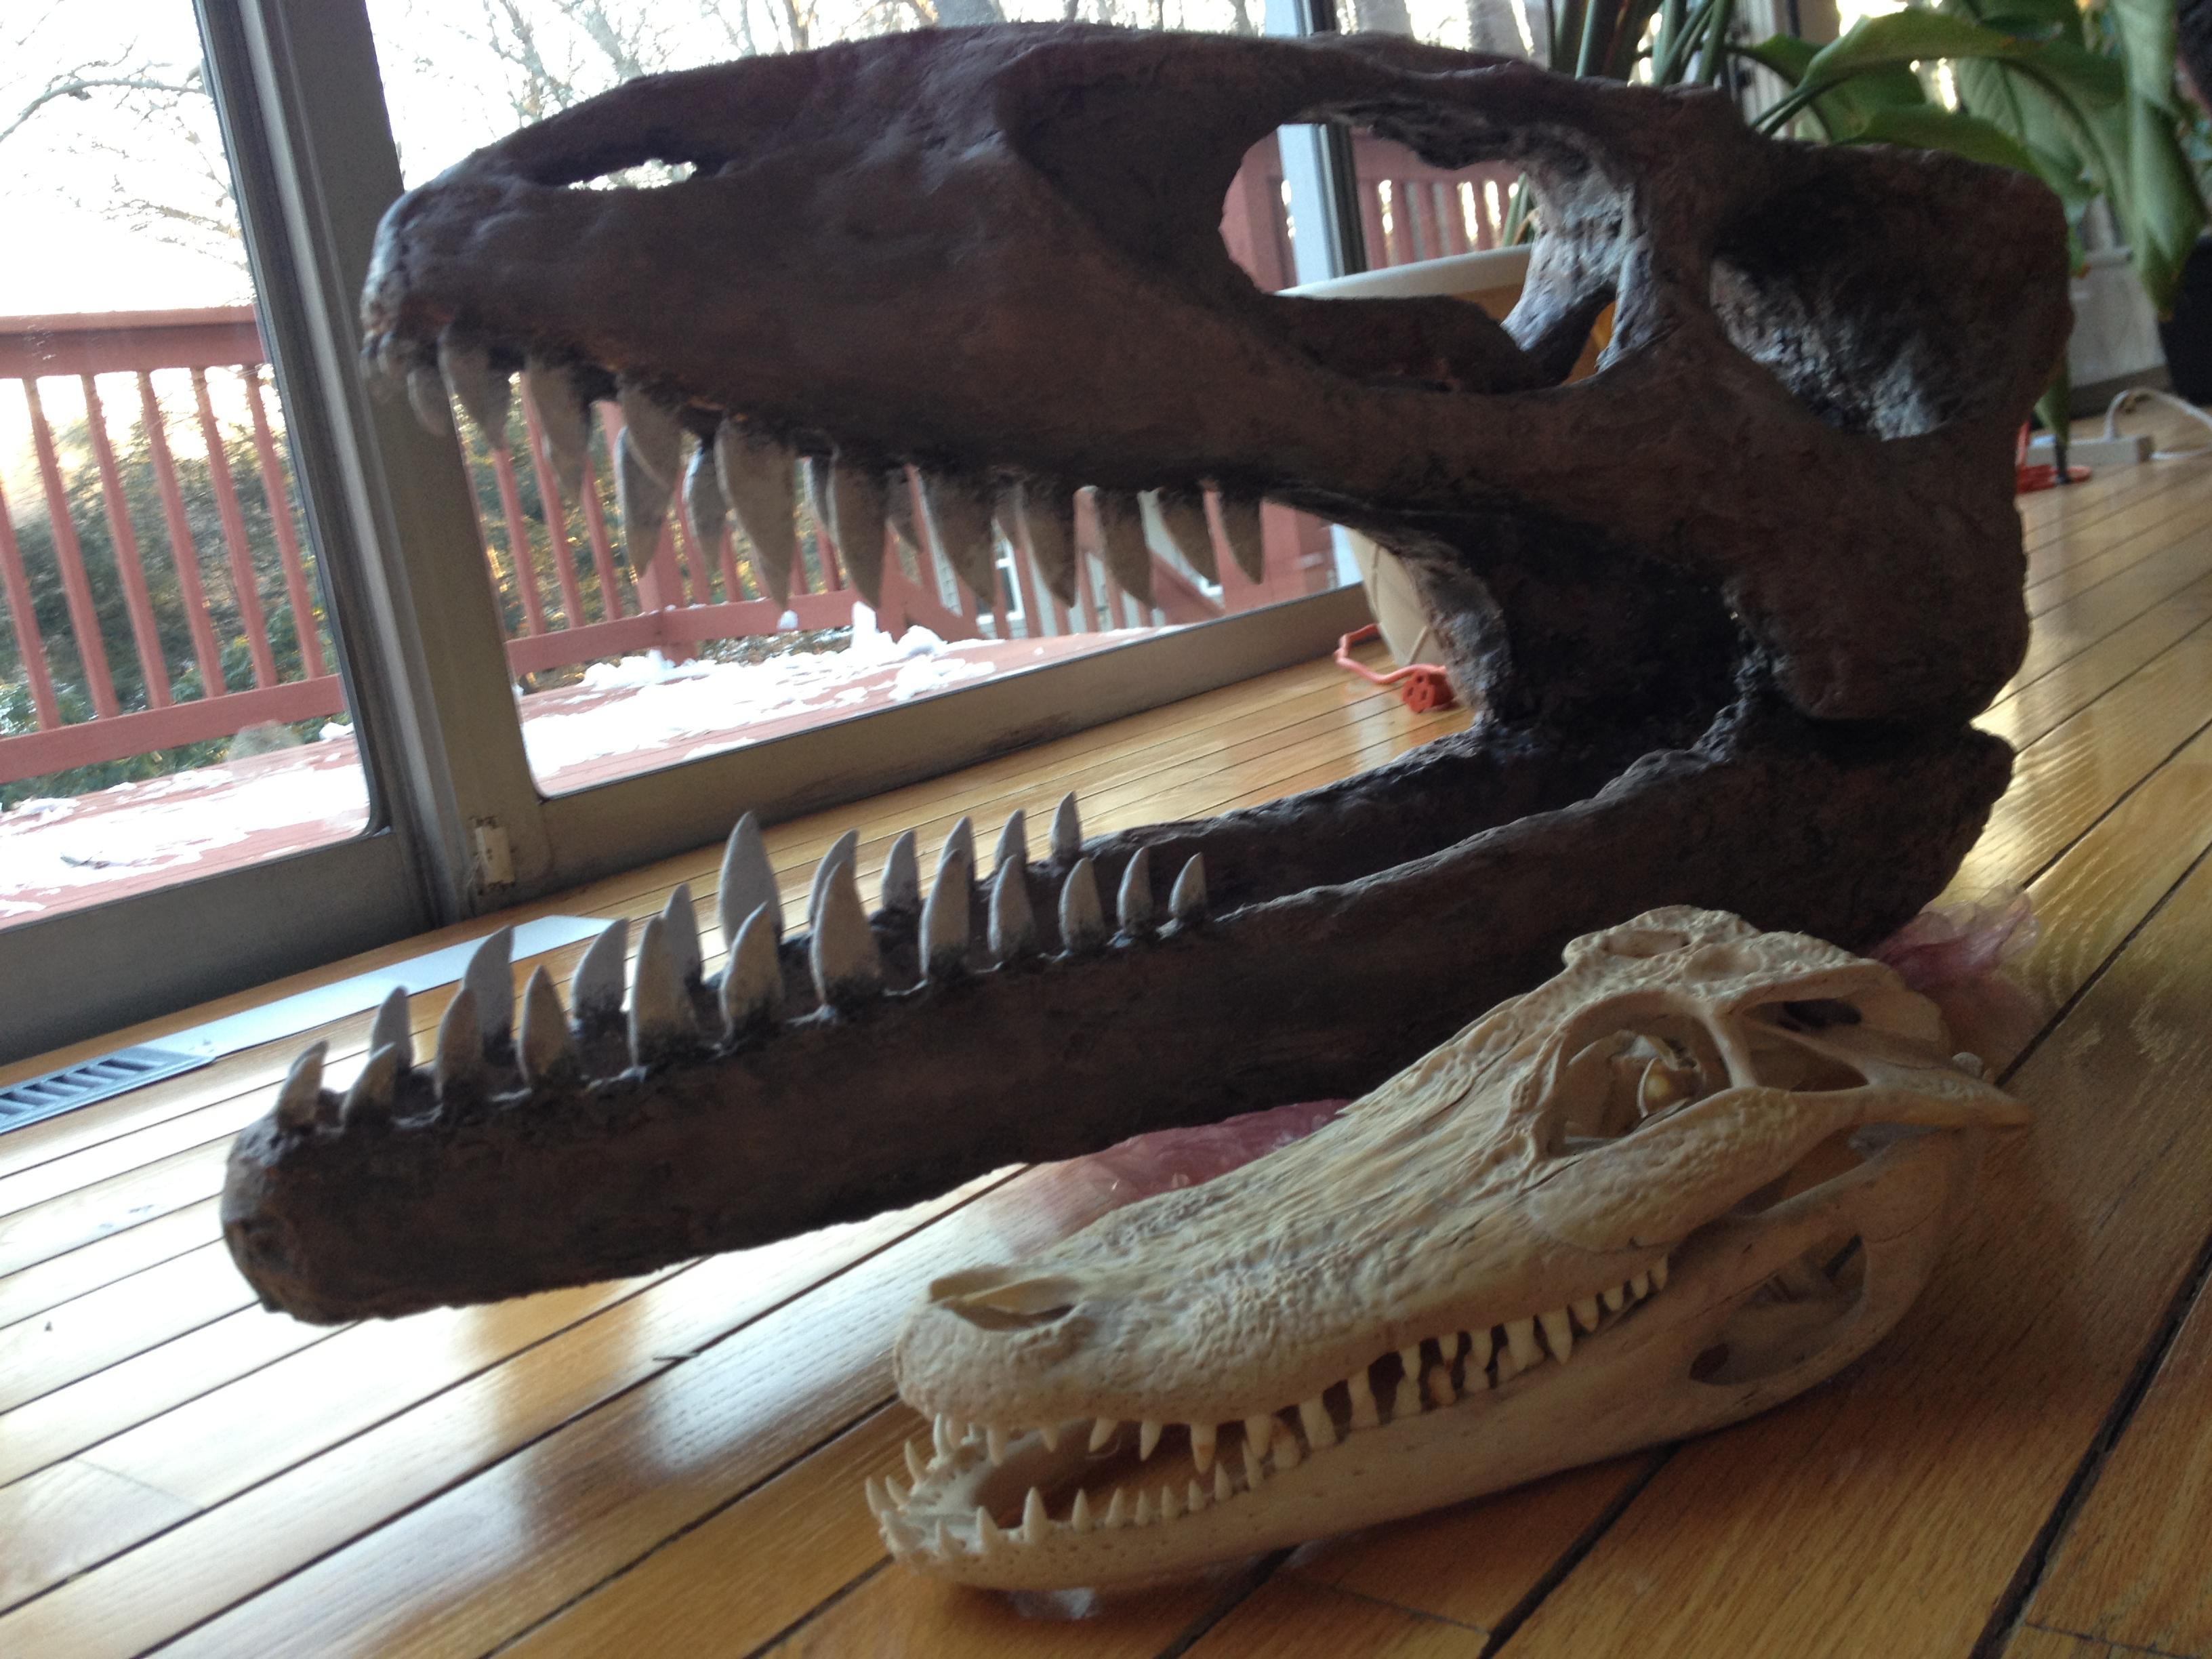 dinosaur excavation kit instructions